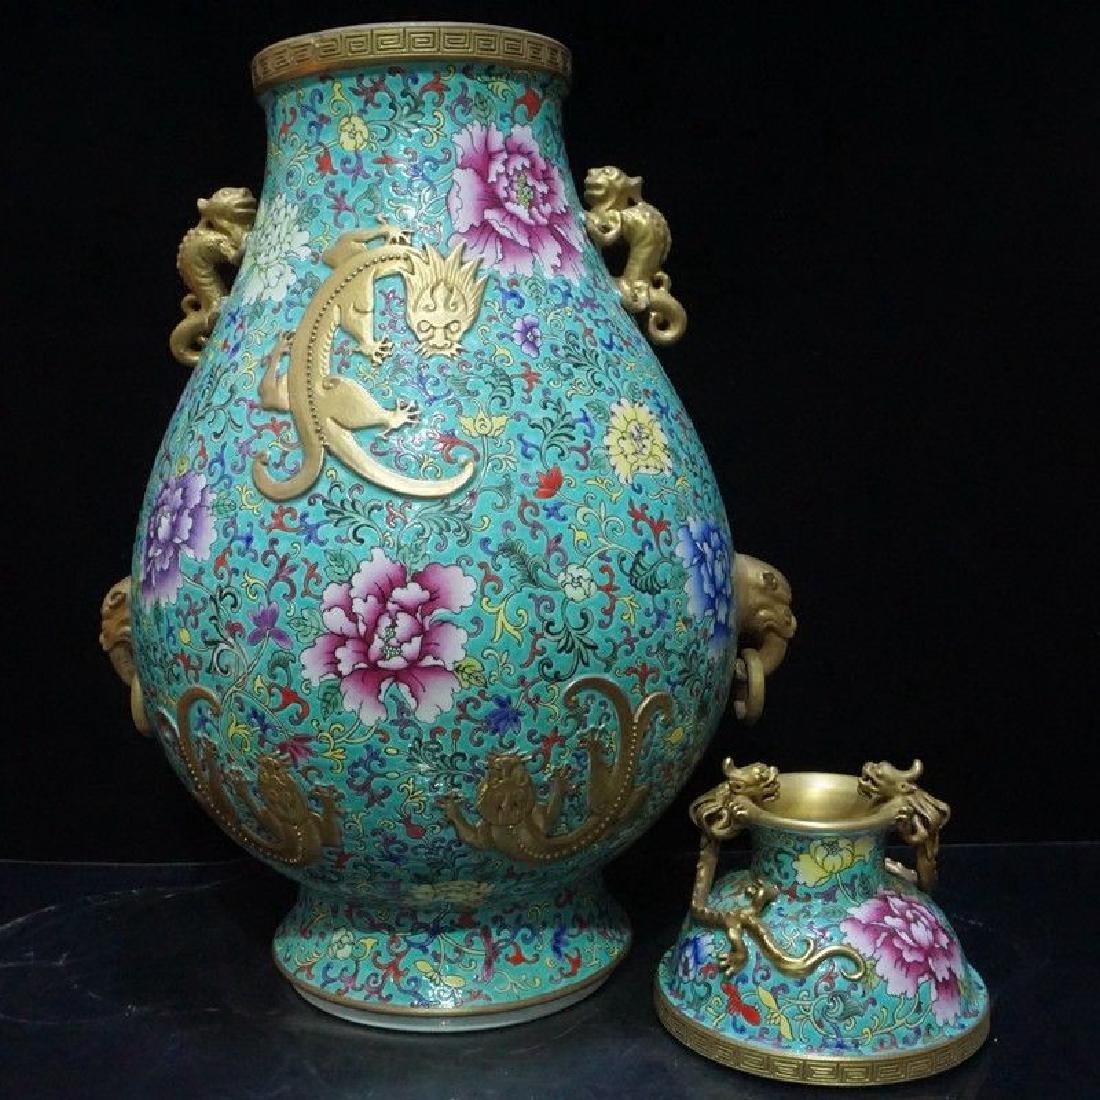 A Famille Rose and Gilt Decorated Porcelain Vase - 2